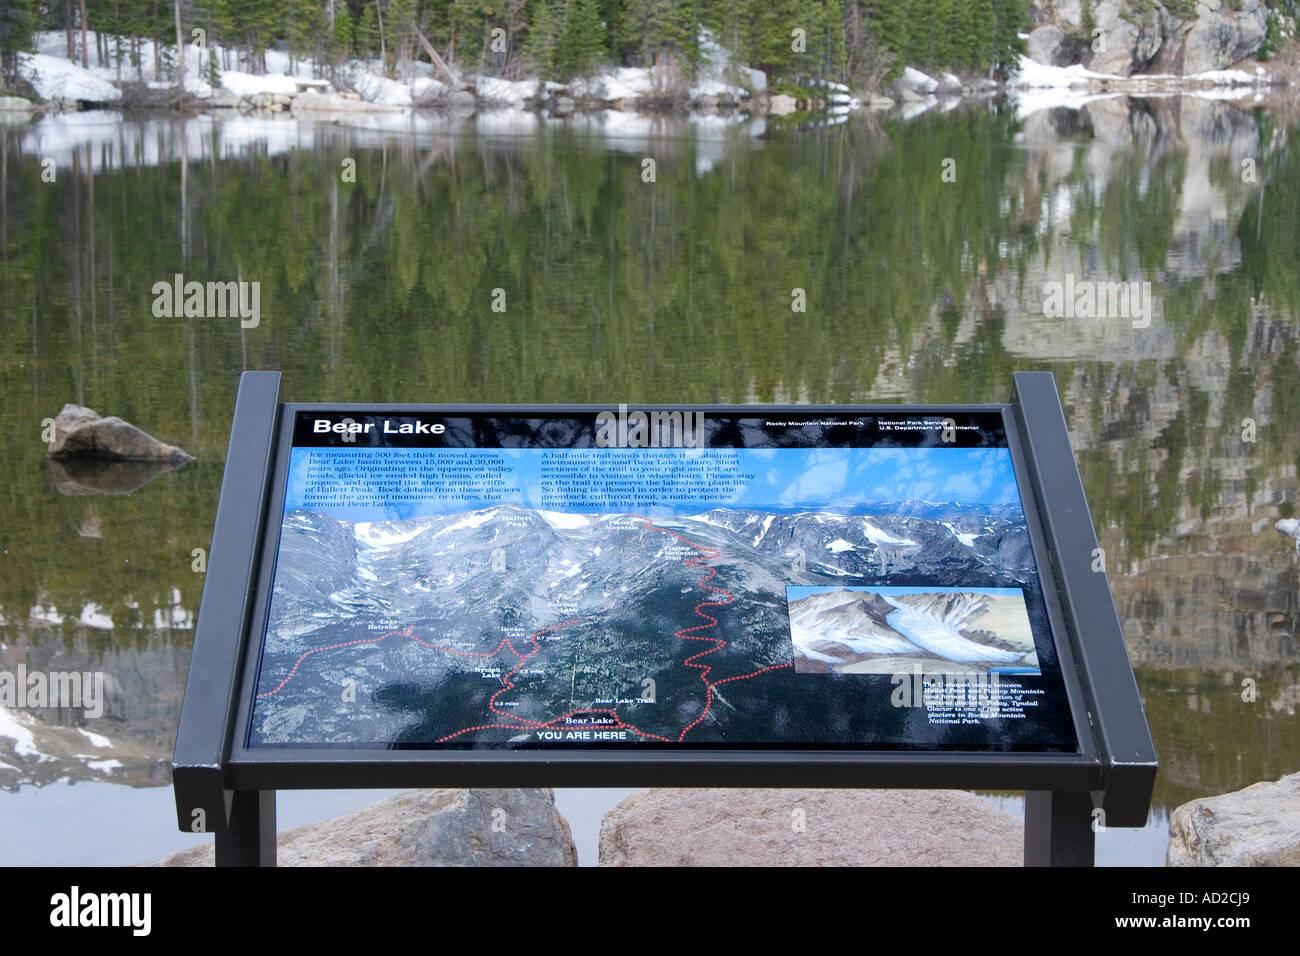 Tourist Location Information Signage, Bear Lake, Rocky Mountain National Park, Colorado Stock Photo